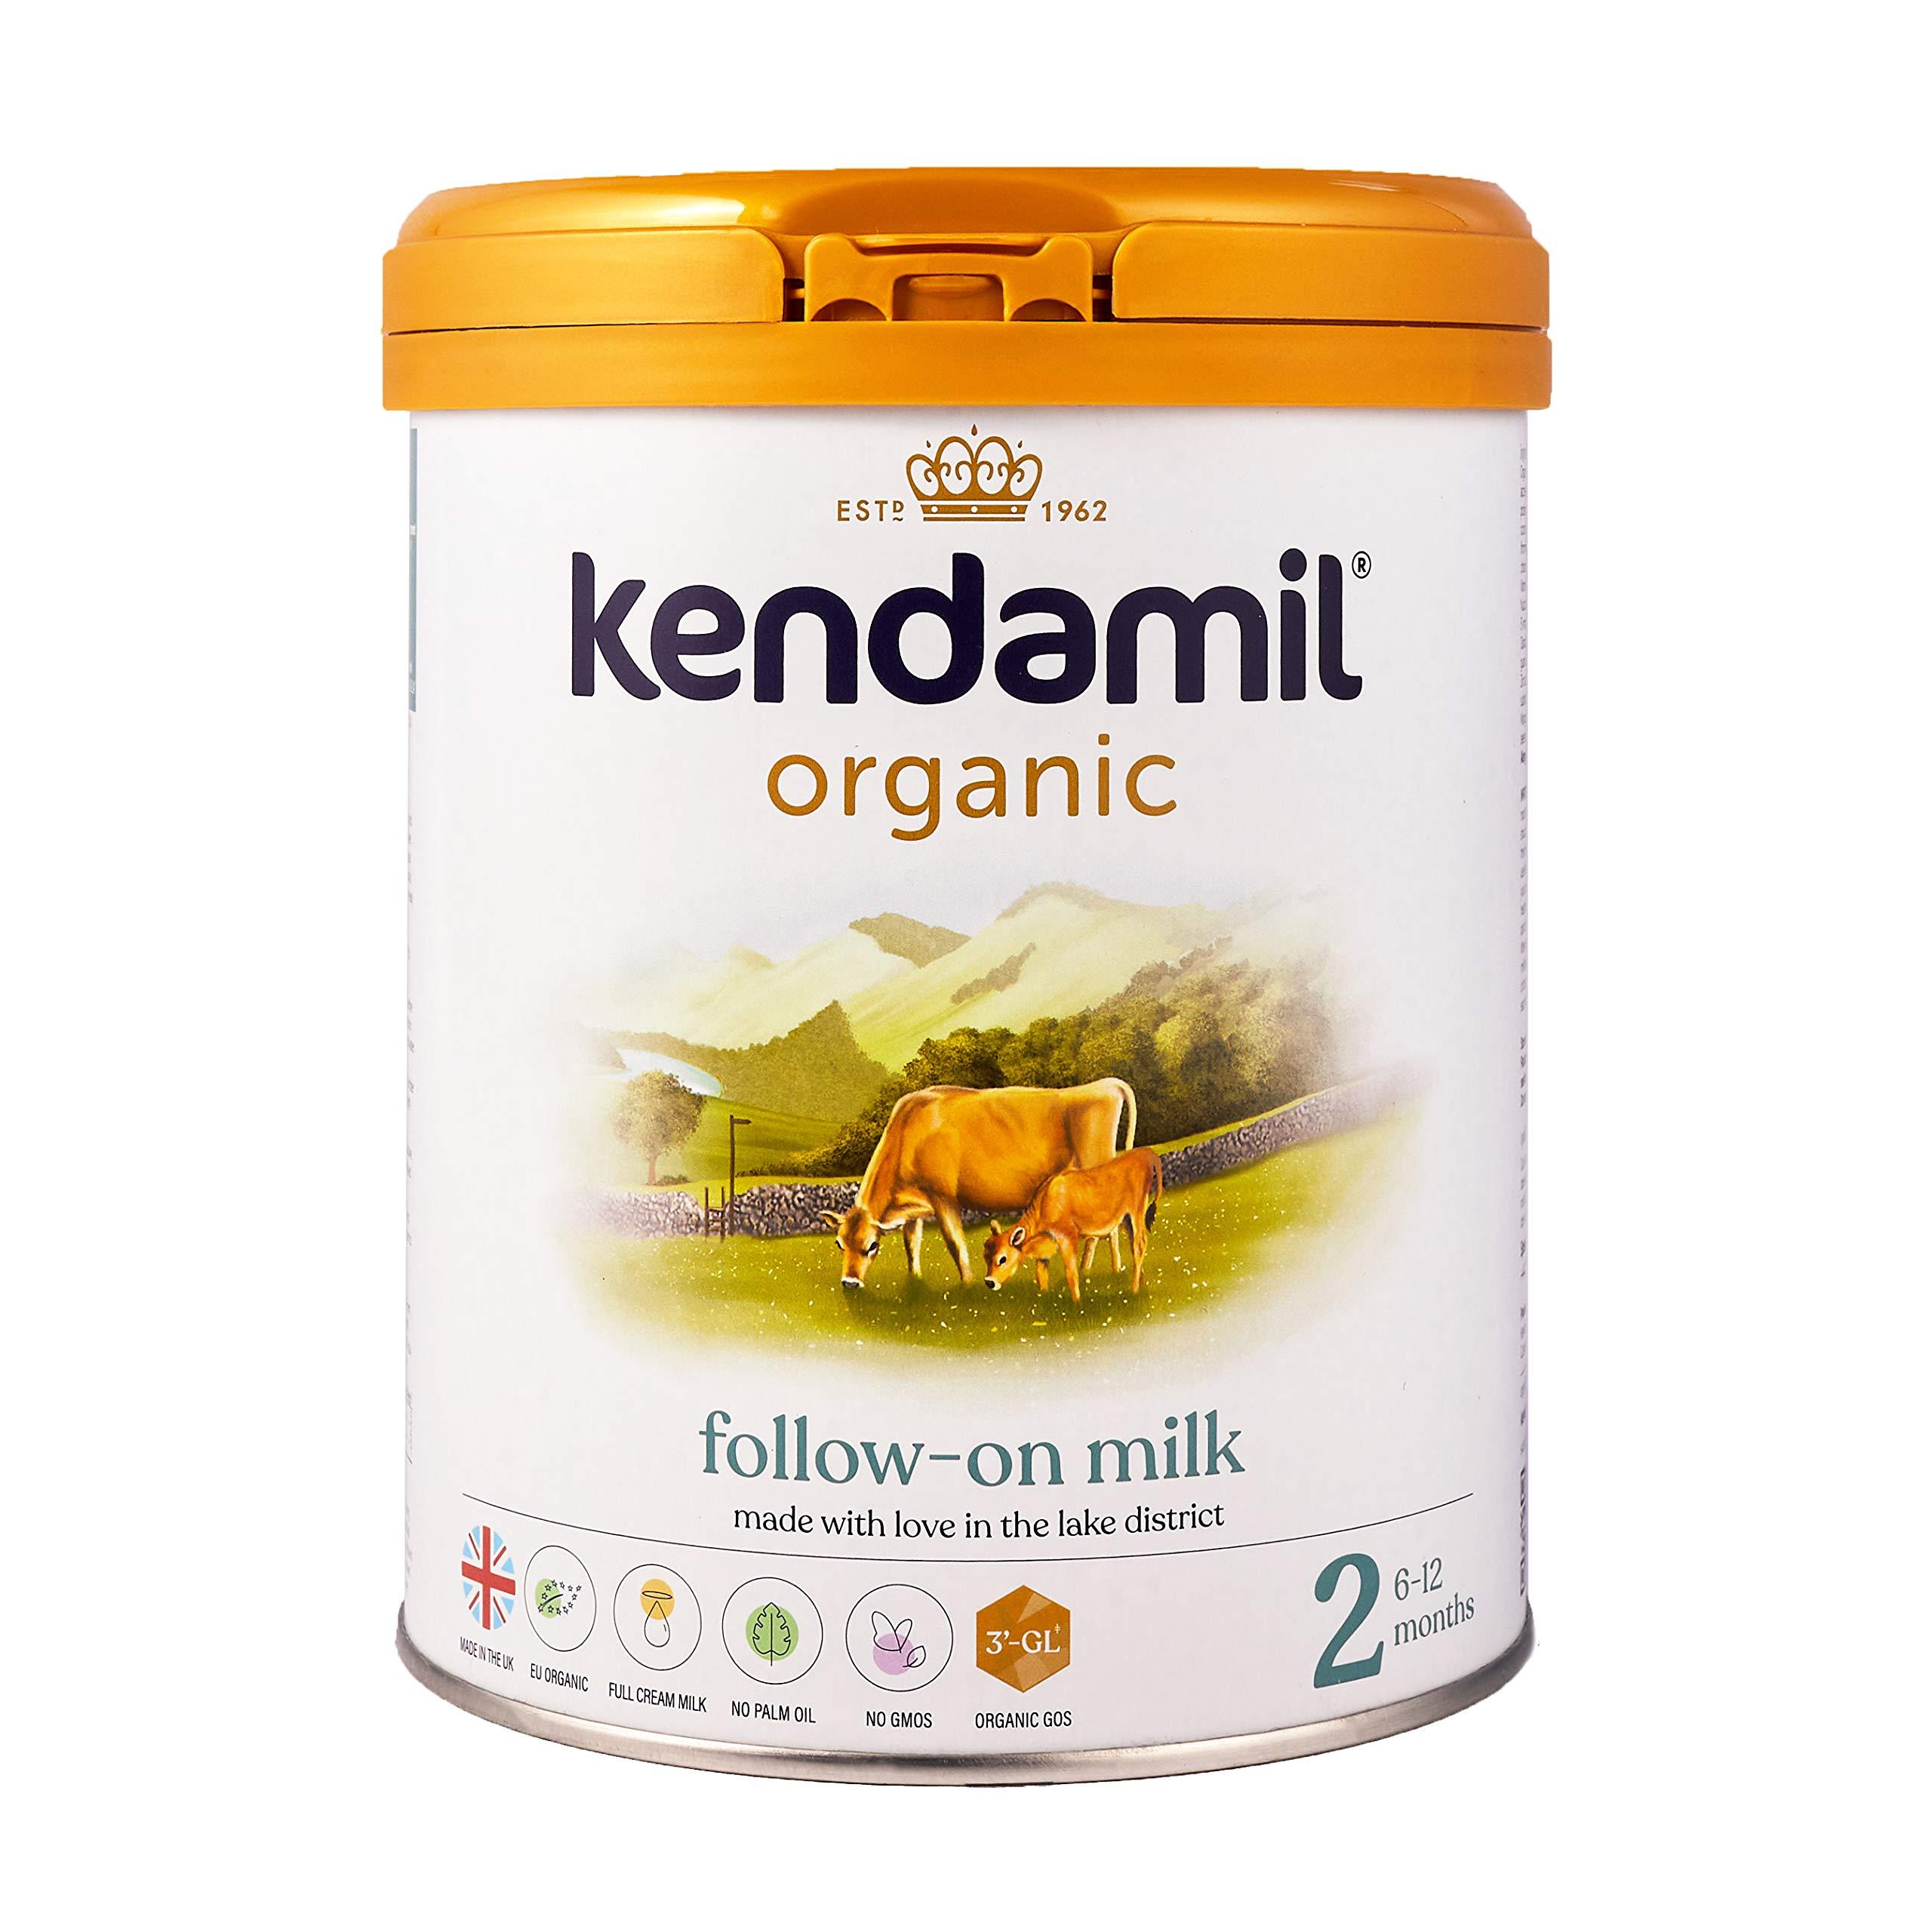 (2x800g) Kendamil Organic Follow On Milk, Stage 2 – British Made, Organic Whole Milk Formula – with HMOs, No Palm Oil, No Fish Oil, No SOYA, No GMOs